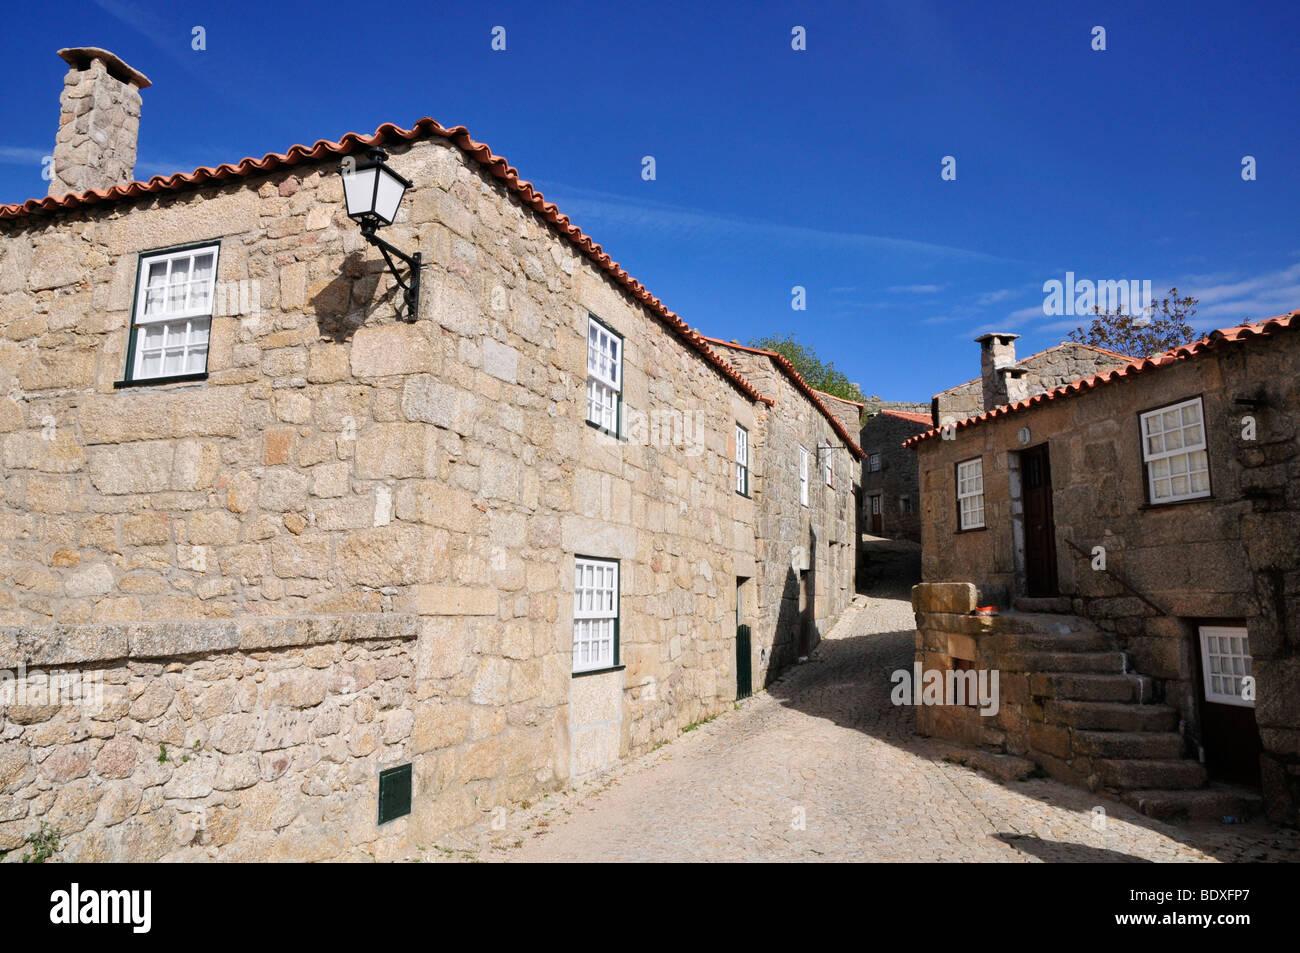 Houses, Historic village of Sortelha, Portugal - Stock Image